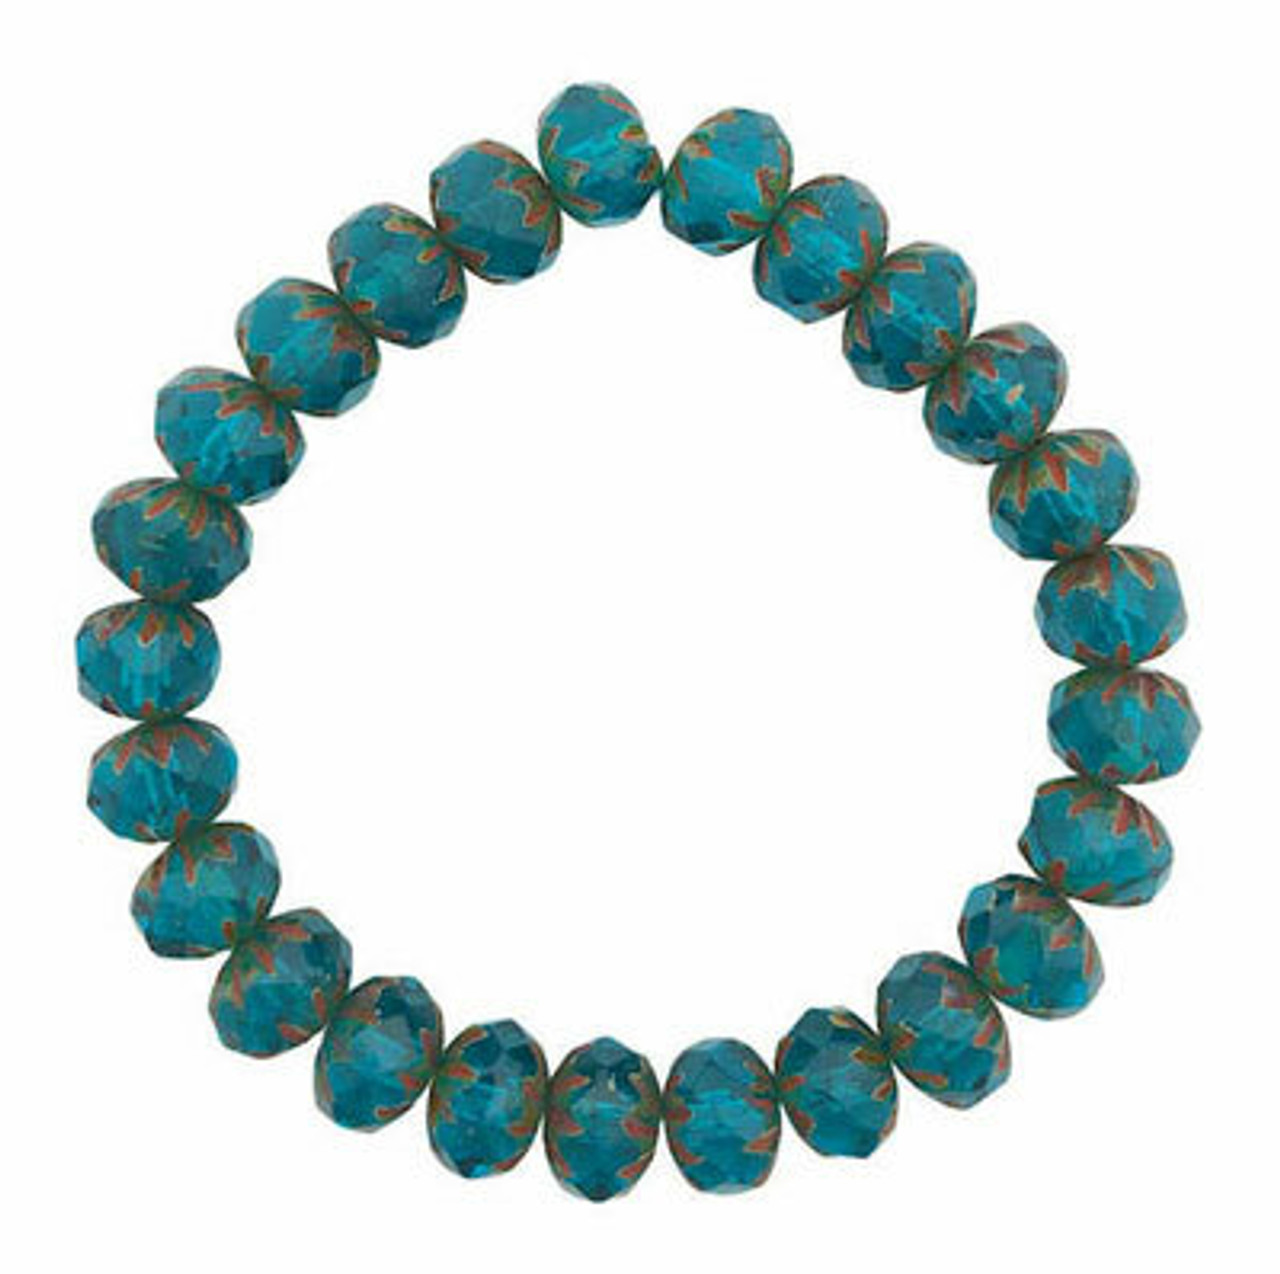 Cruller Rondelle Beads